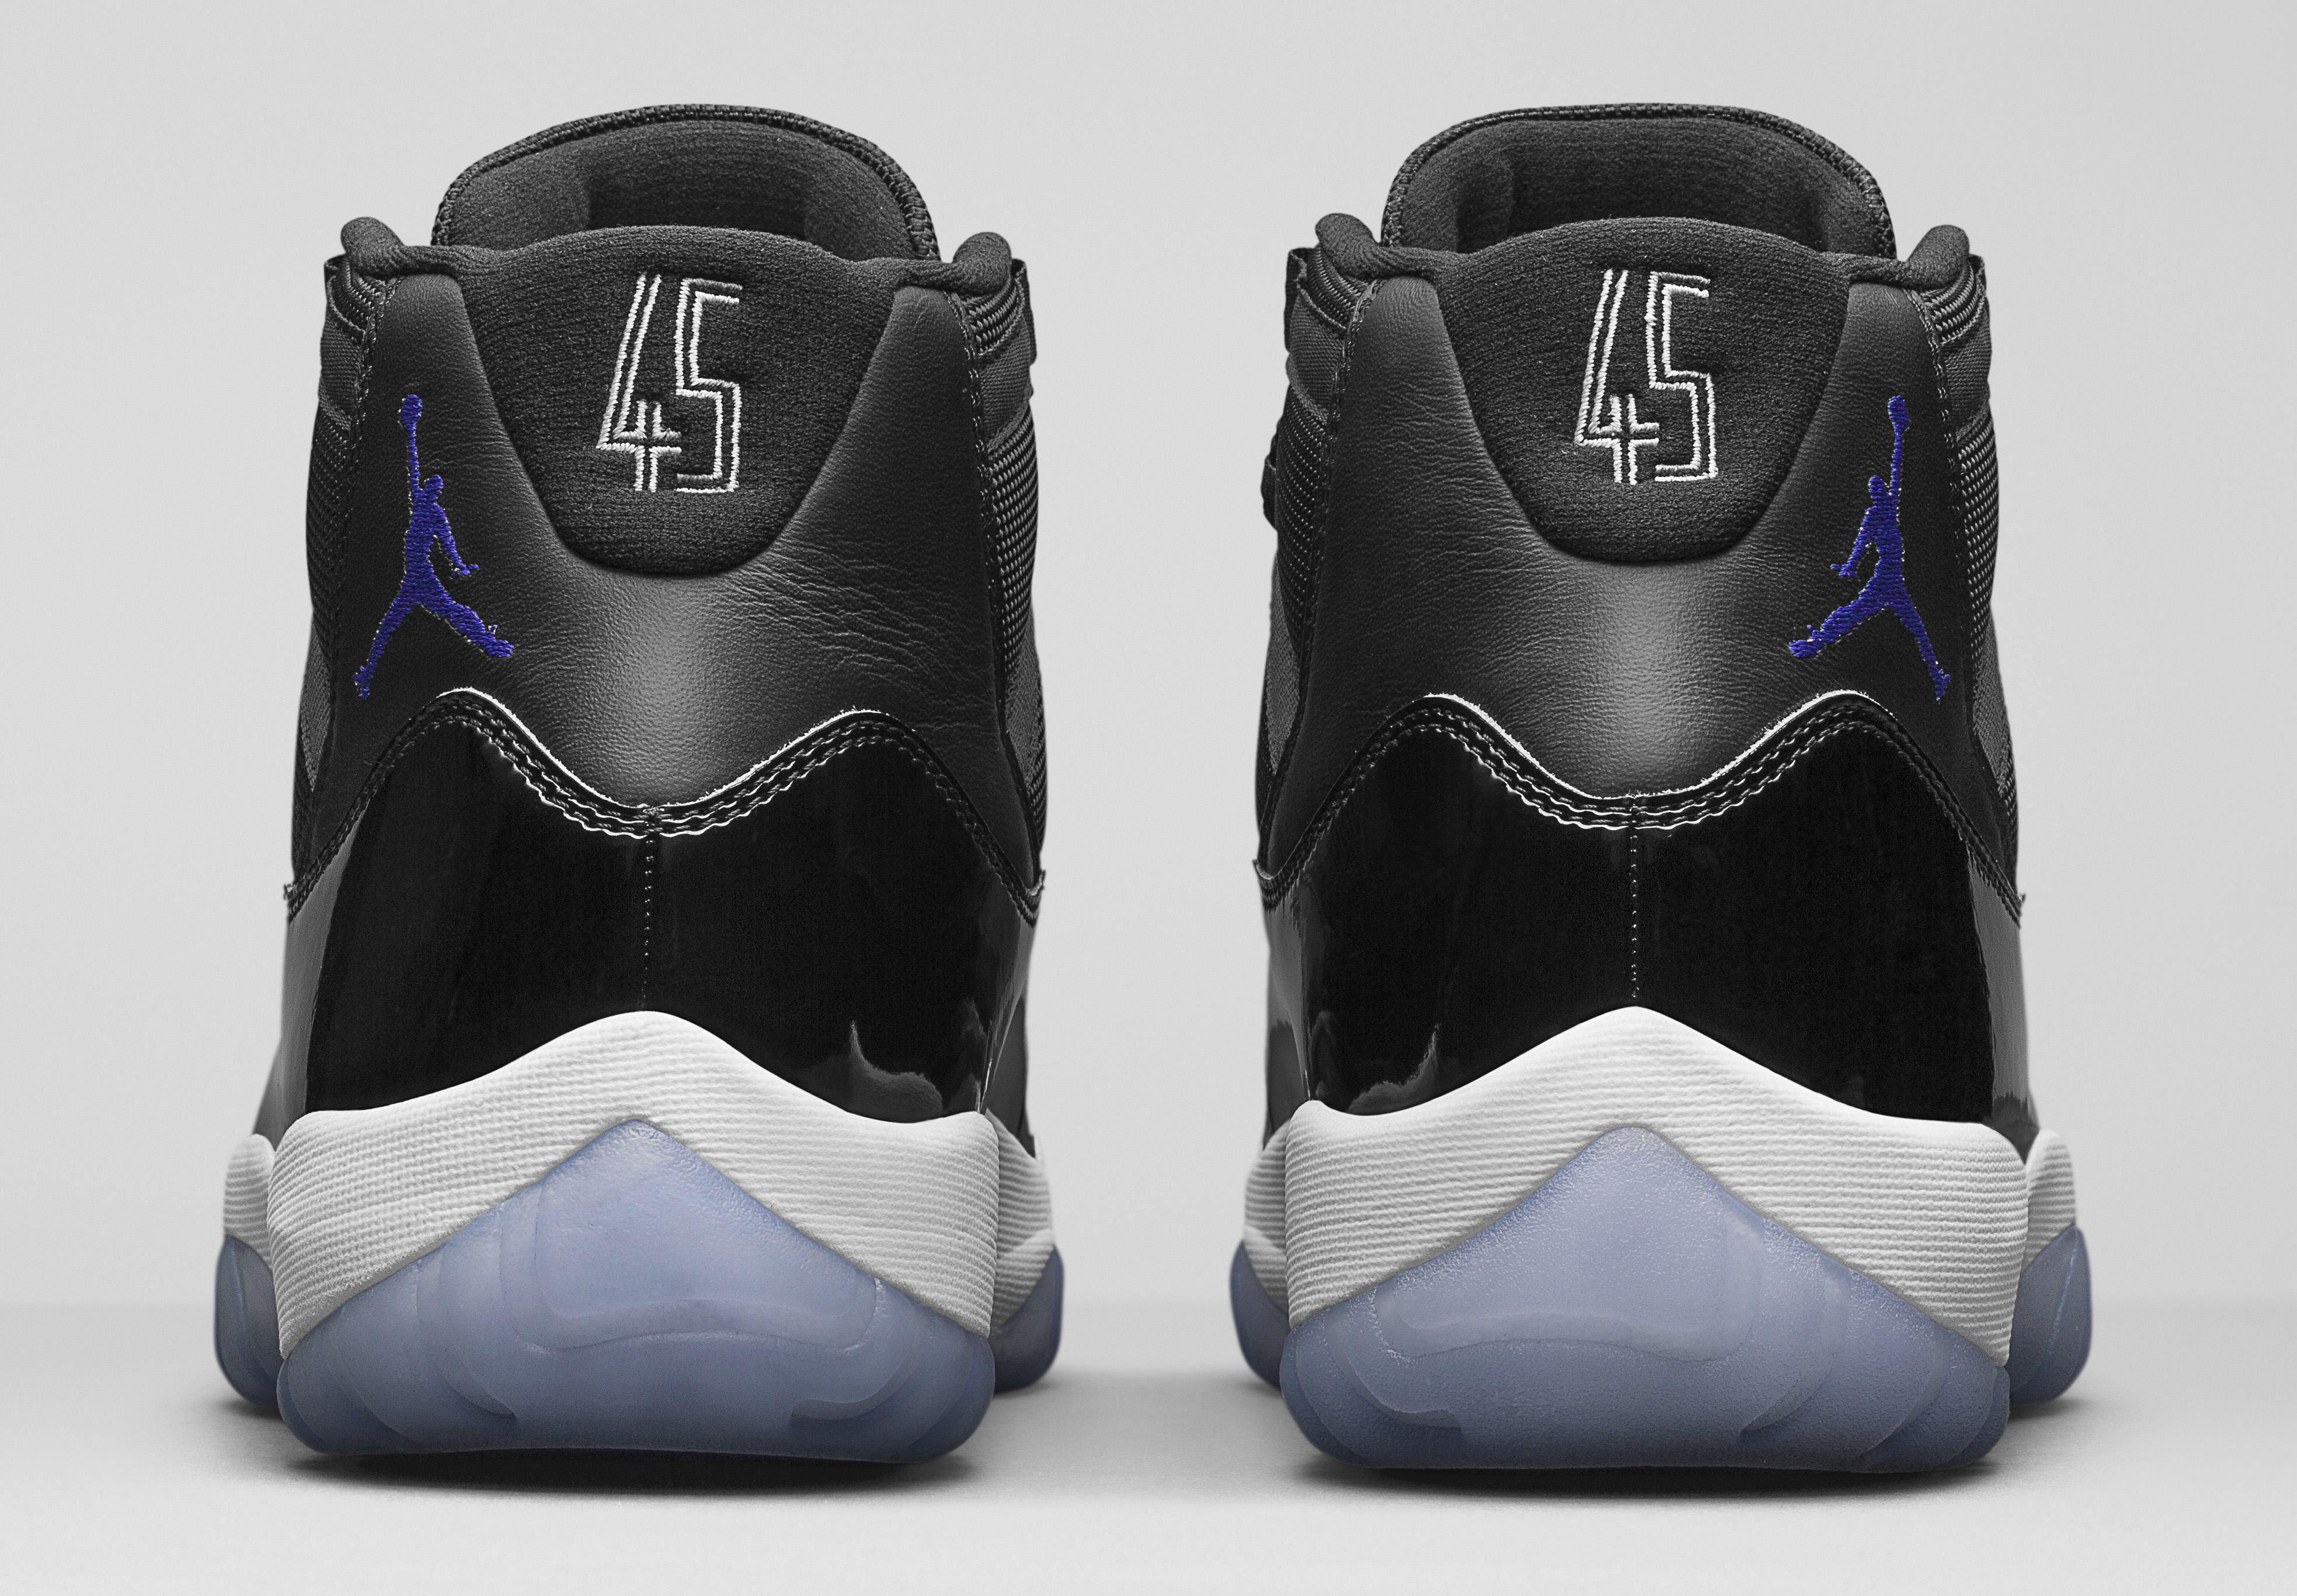 quality design 02cde 6cbd5 Image via Nike Jordan 11 Space Jam Heel